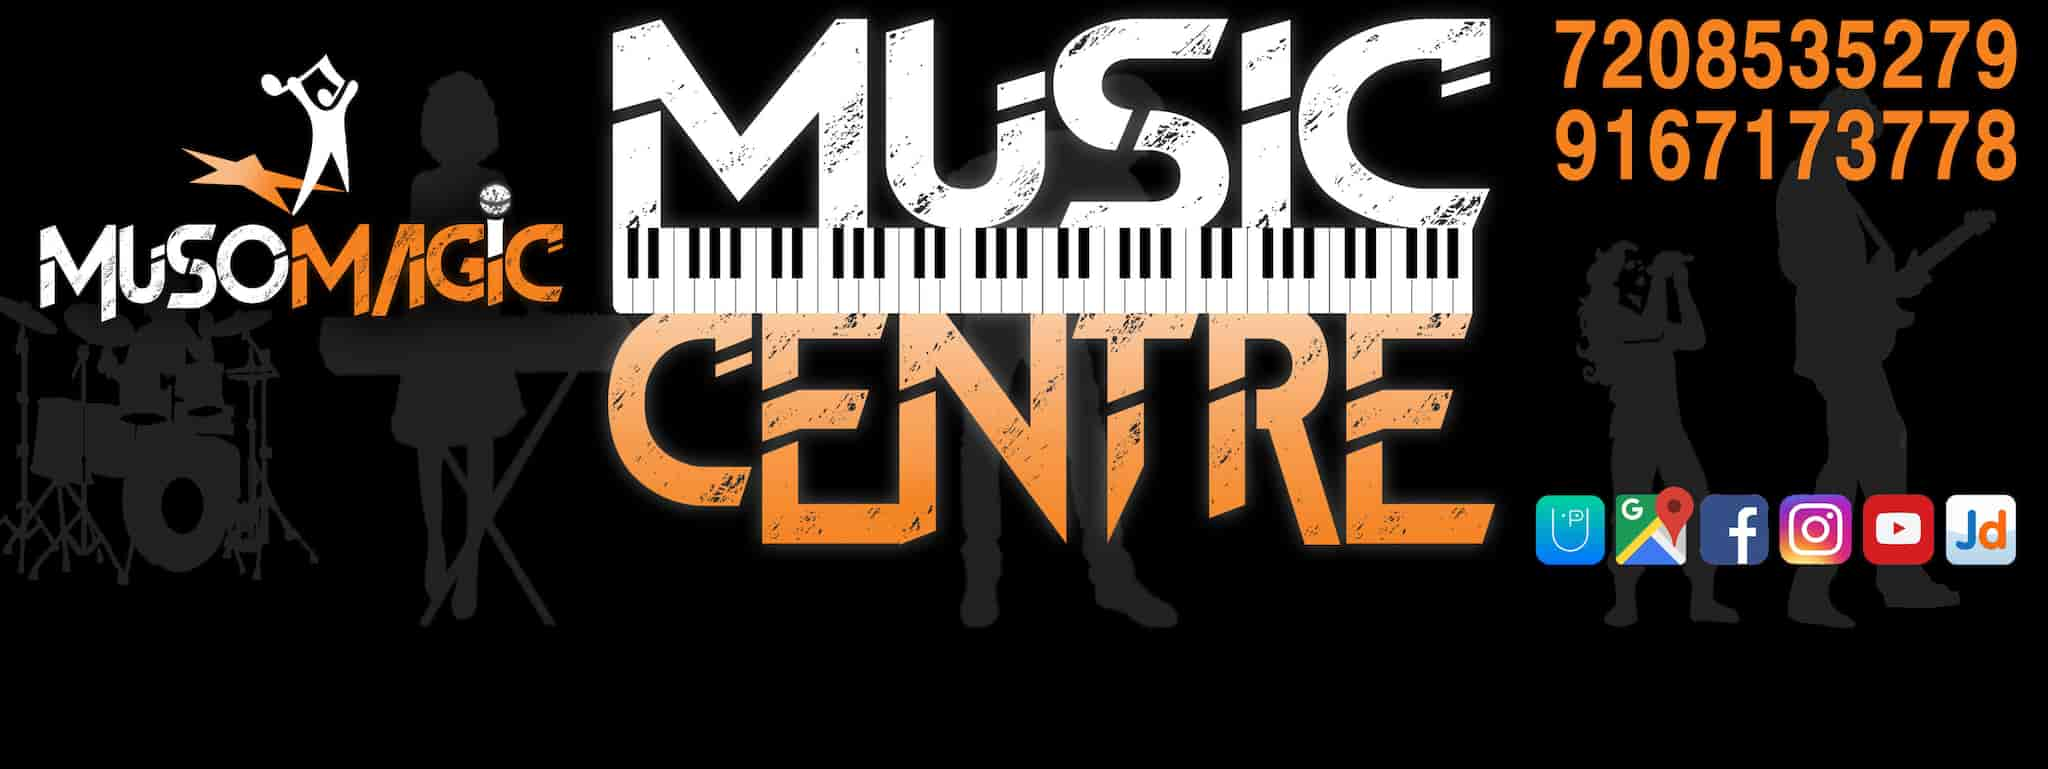 Muso Magic Music And Dance Academy, Kharghar Sector 12